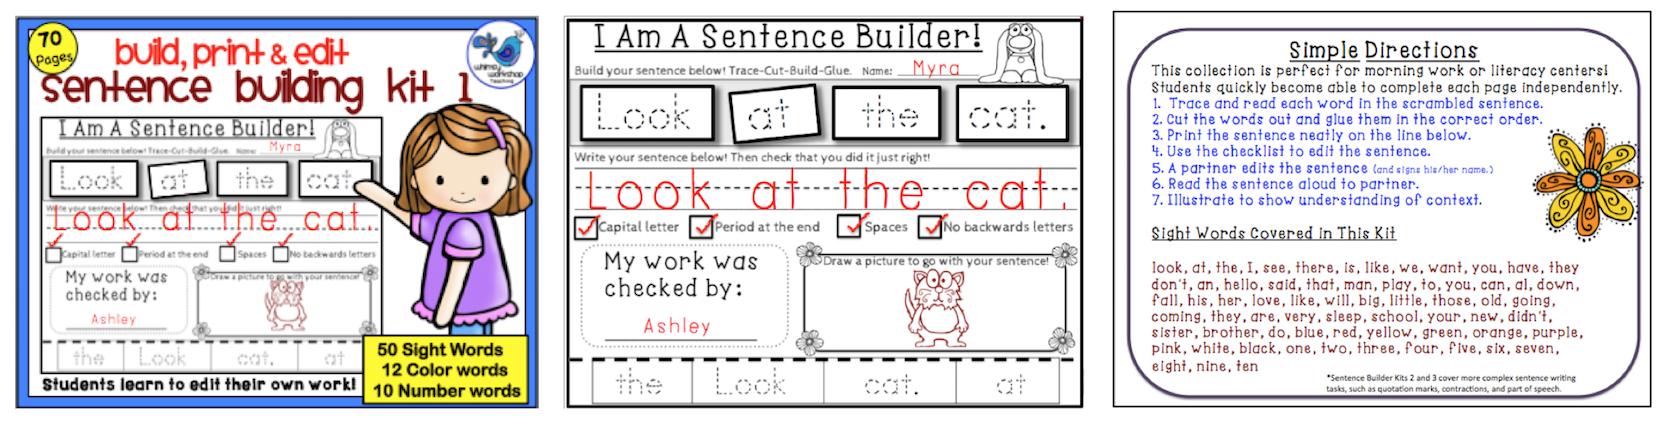 Sentence Building Kit 1.